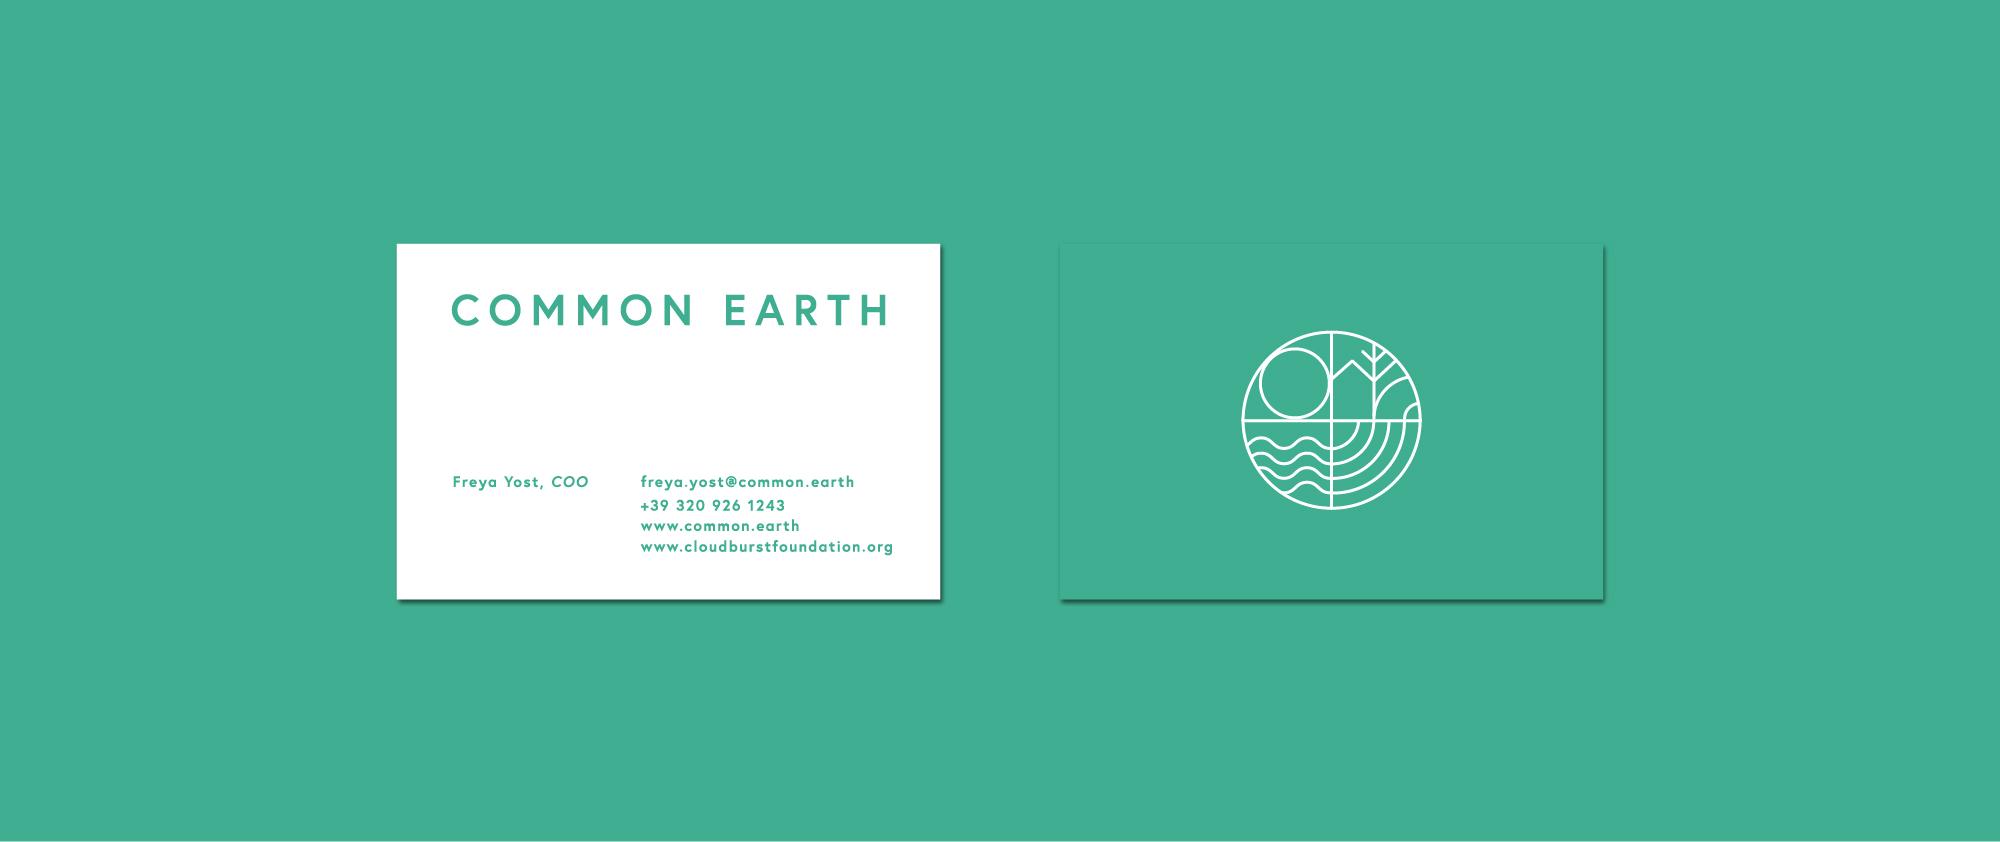 viscayawagner_select_common-earth_-04.jpg